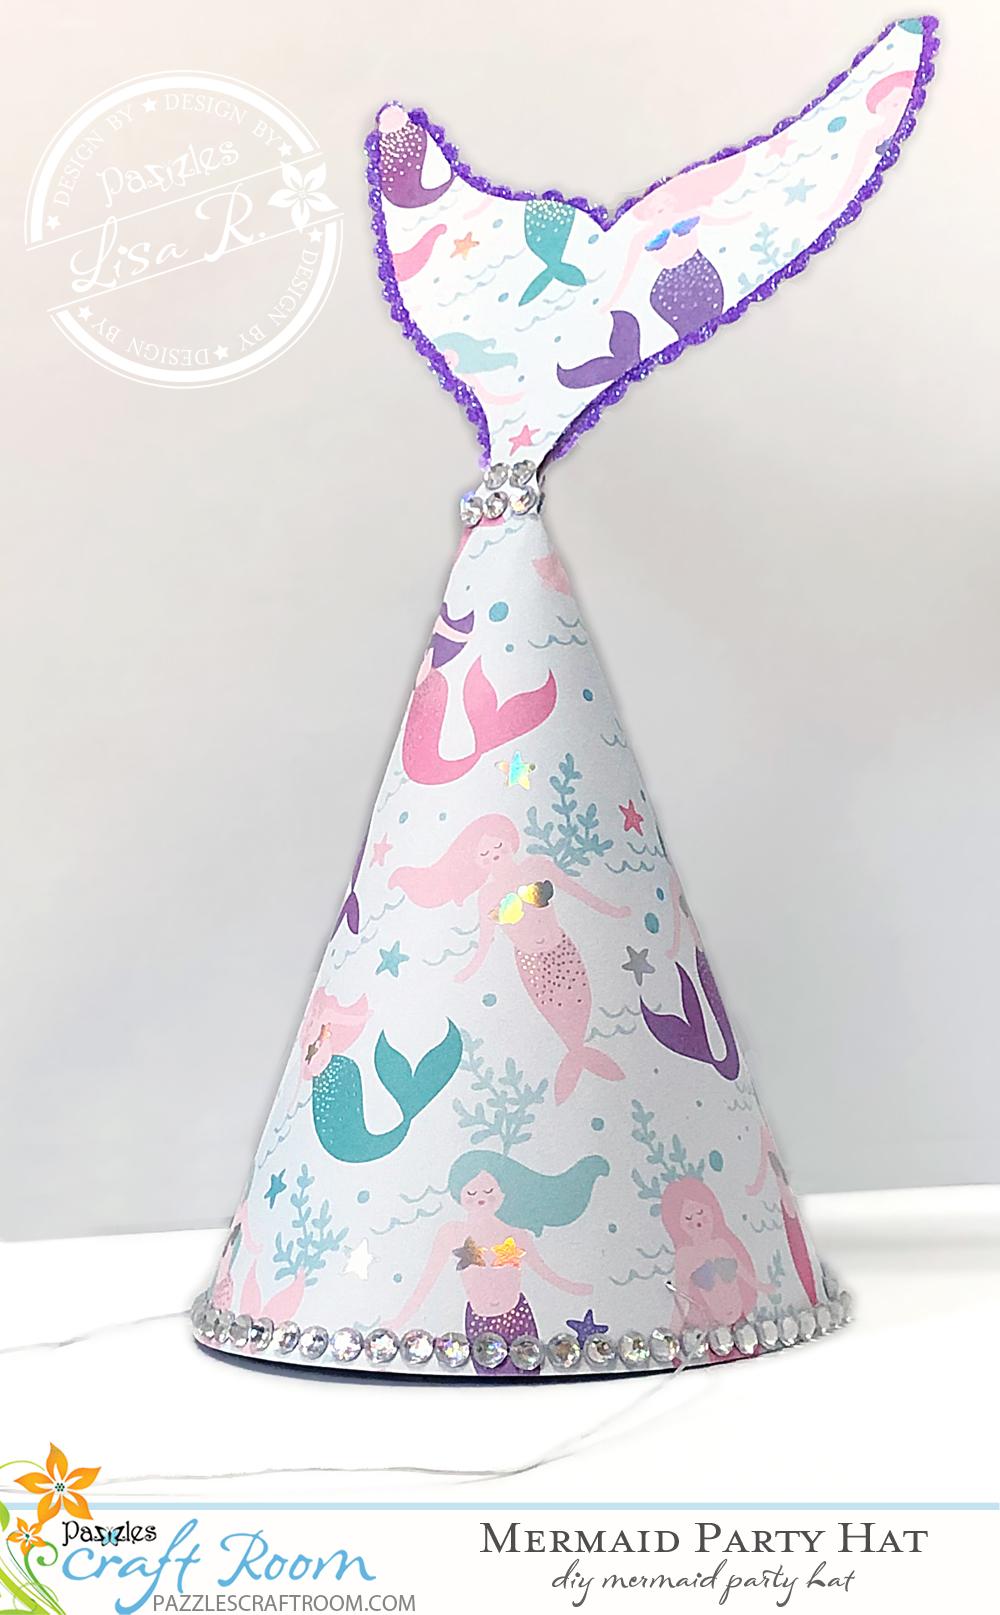 Pazzles DIY Mermaid Party Hat by Lisa Reyna